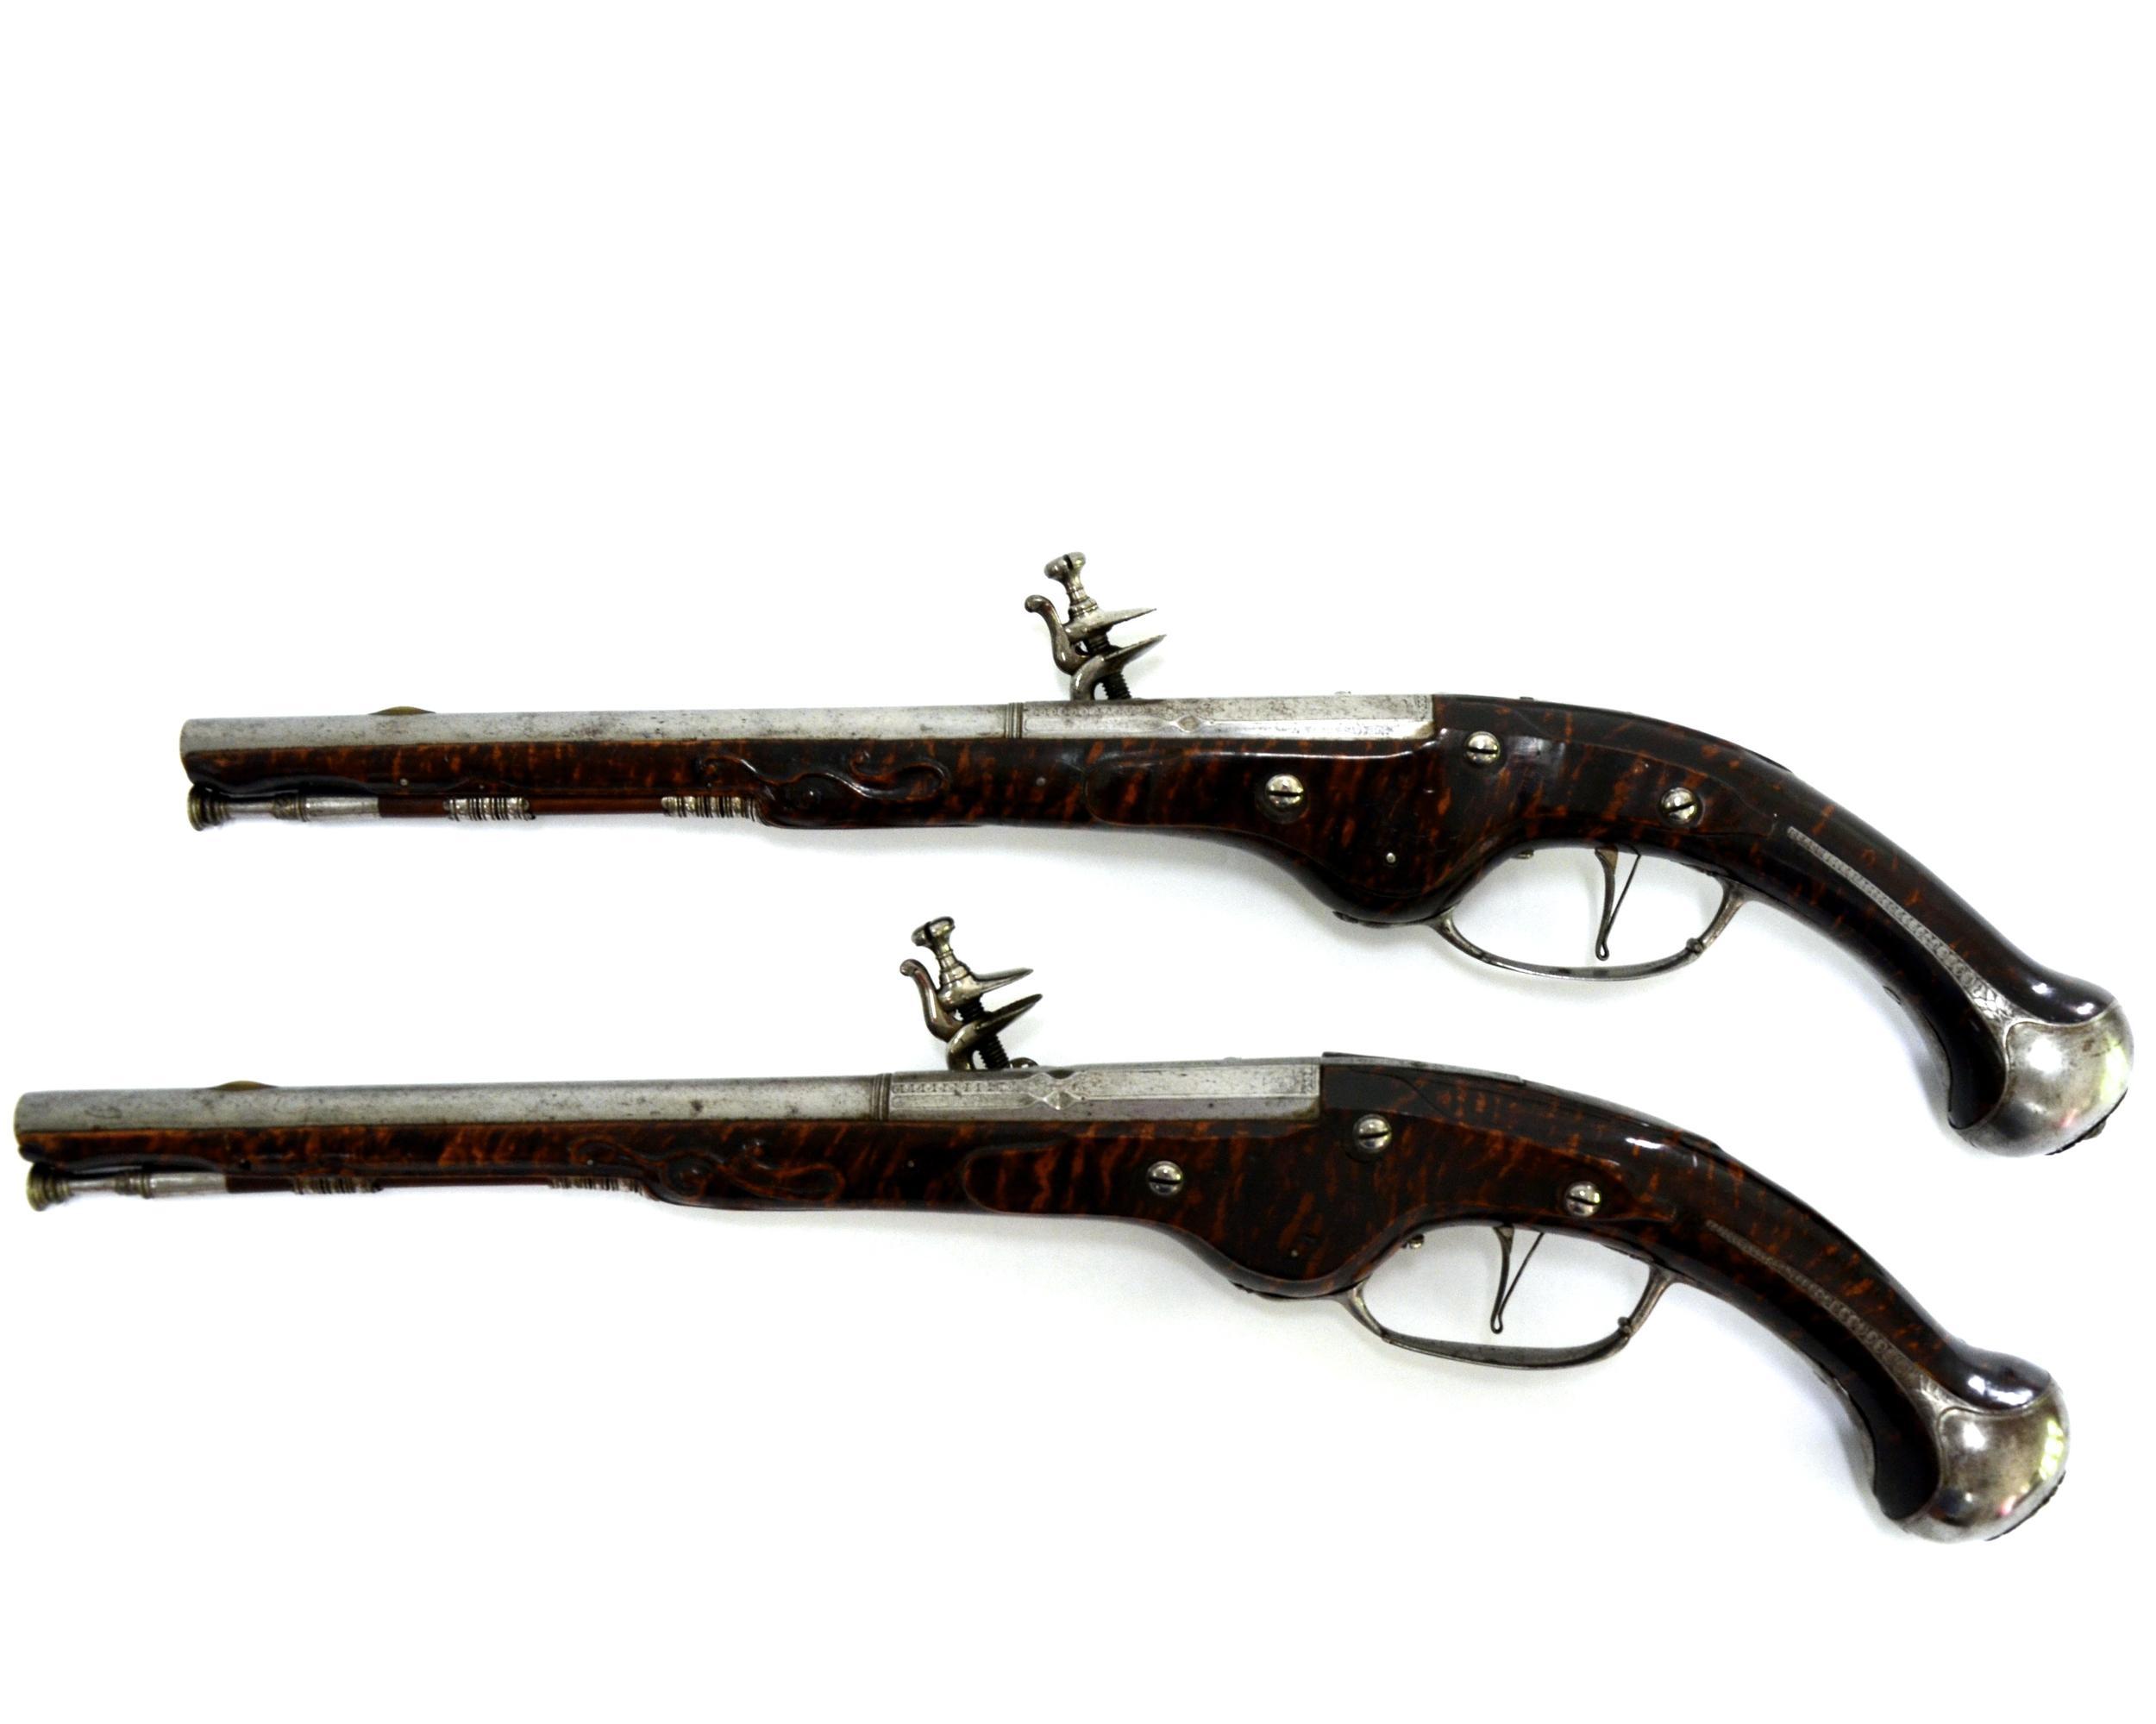 pair-bohemian-wheellock-pistols-hans-keiner-eger-1670-gary-friedland-antique-arms-armor1.jpg